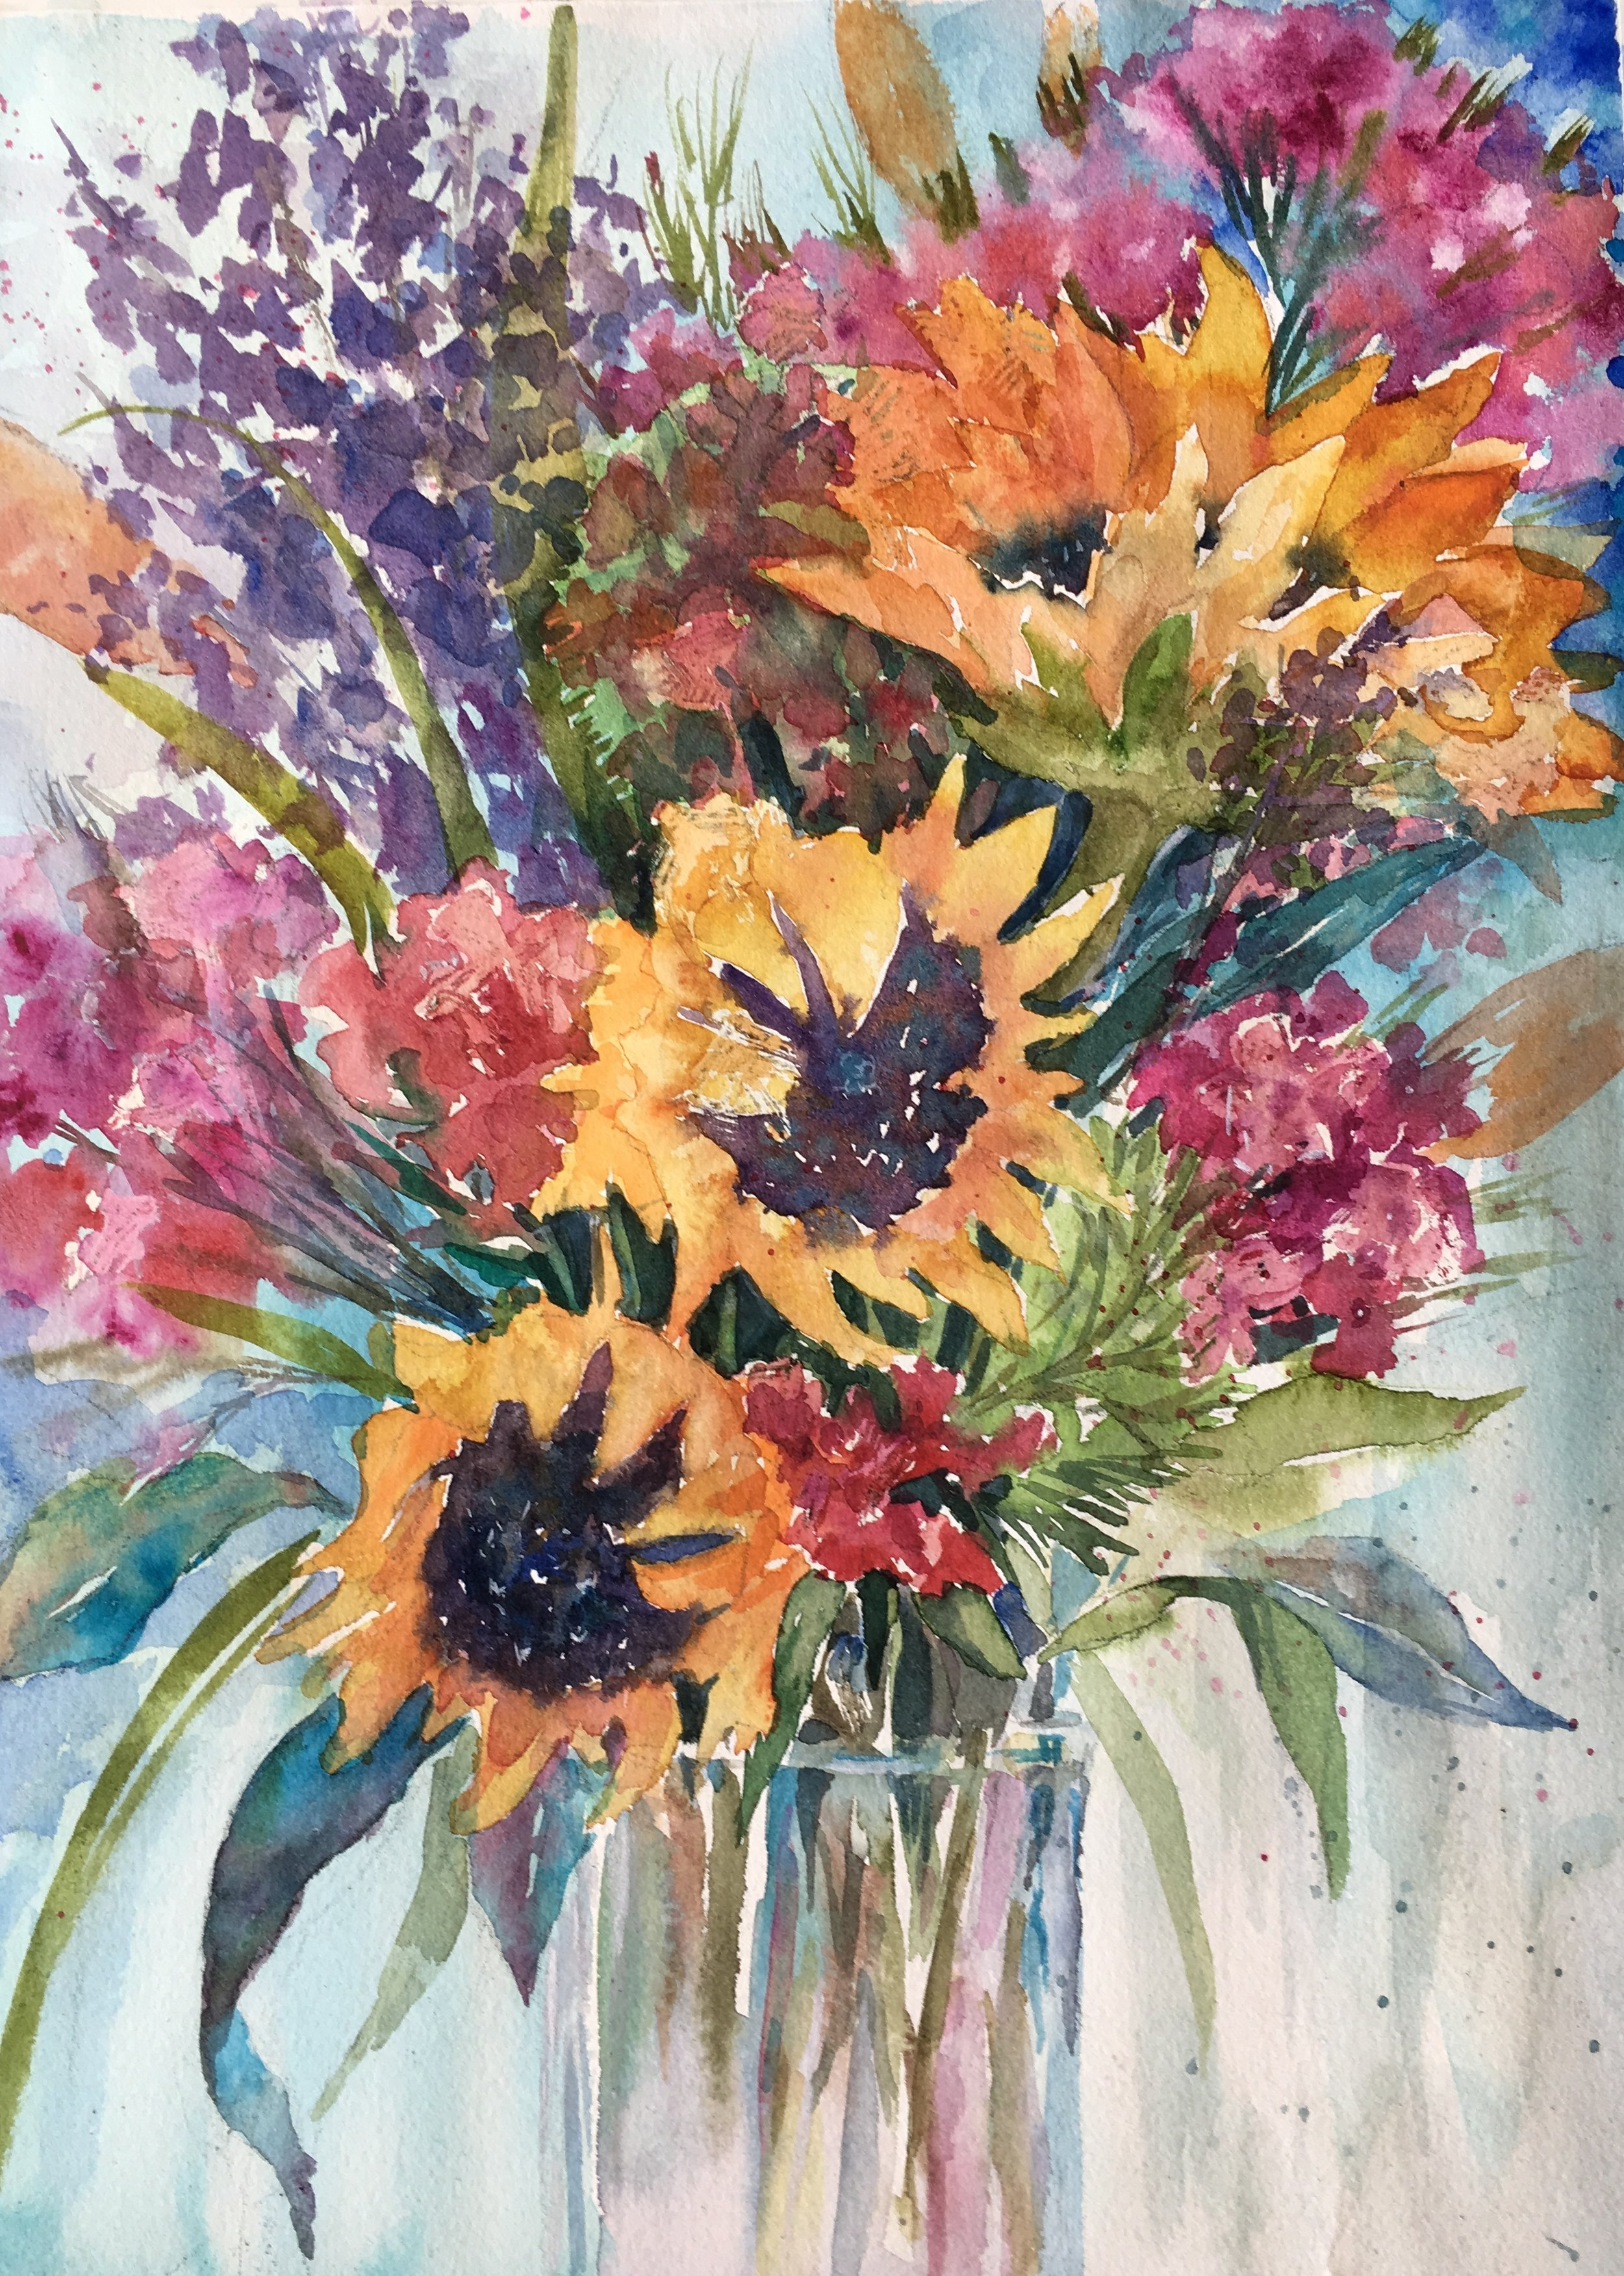 """Sunflower's joy"" 16x20, Watercolor on watercolor paper by Svetlana Howe"